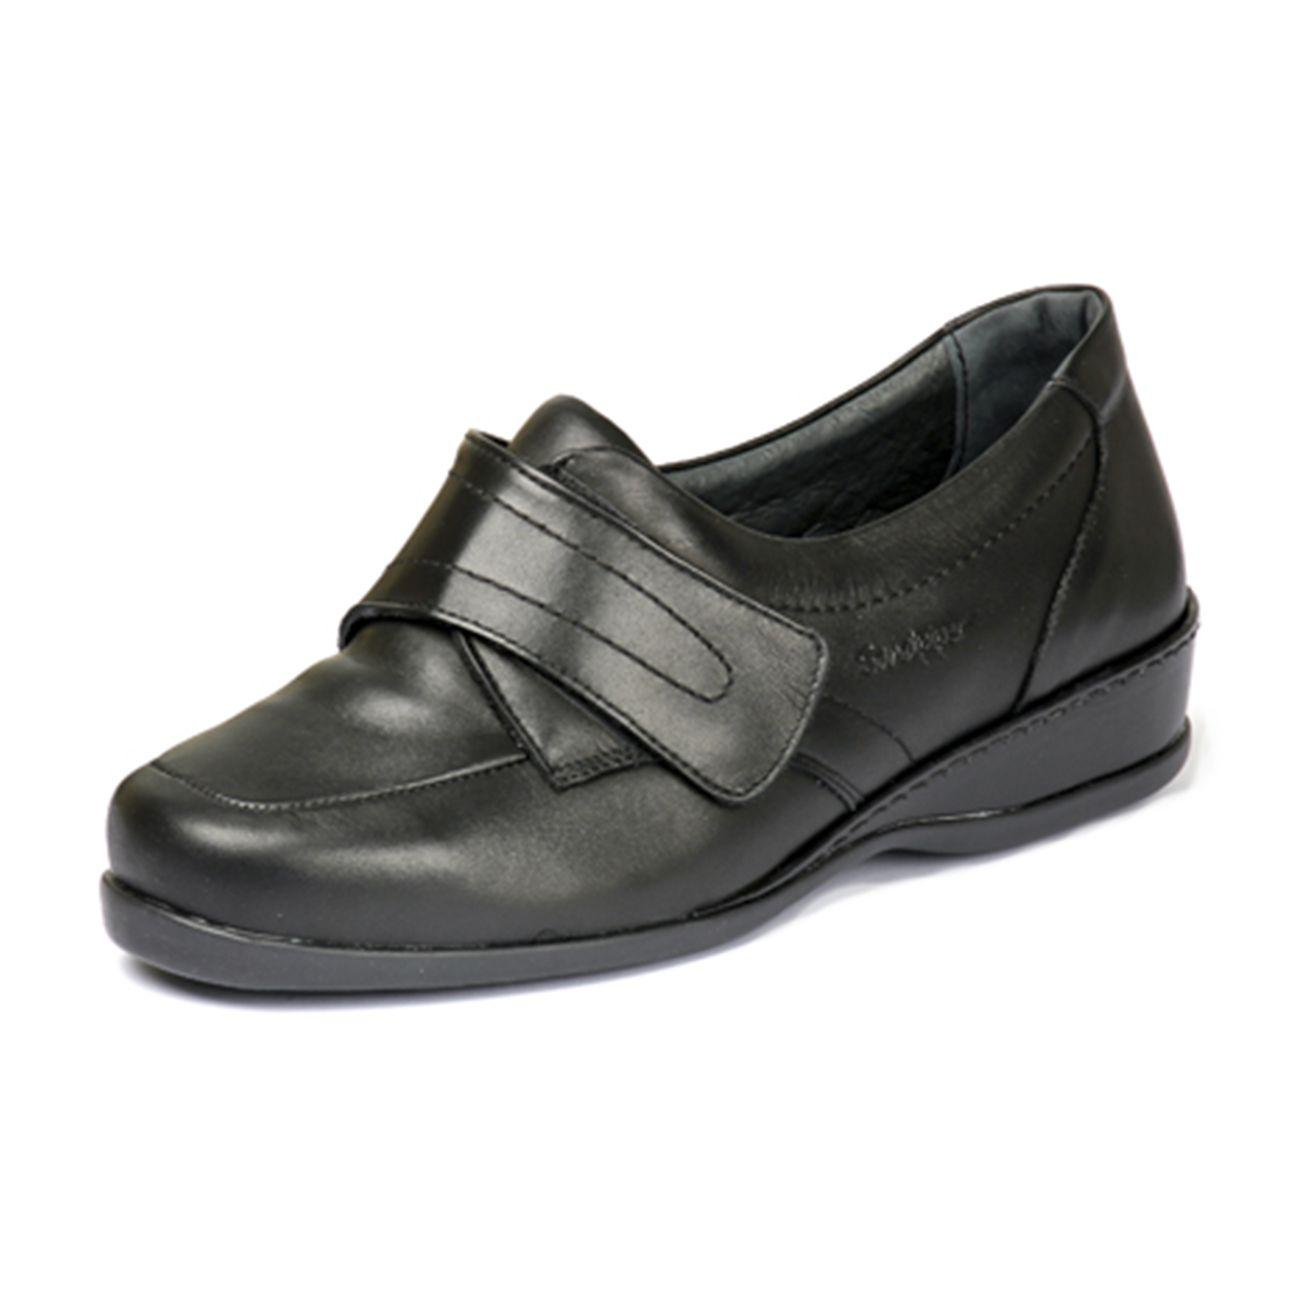 1fb55d4fb1f4 Wardale Ladies Extra Wide Shoe 4E-6E - Wide fitting shoe Black - 39   …